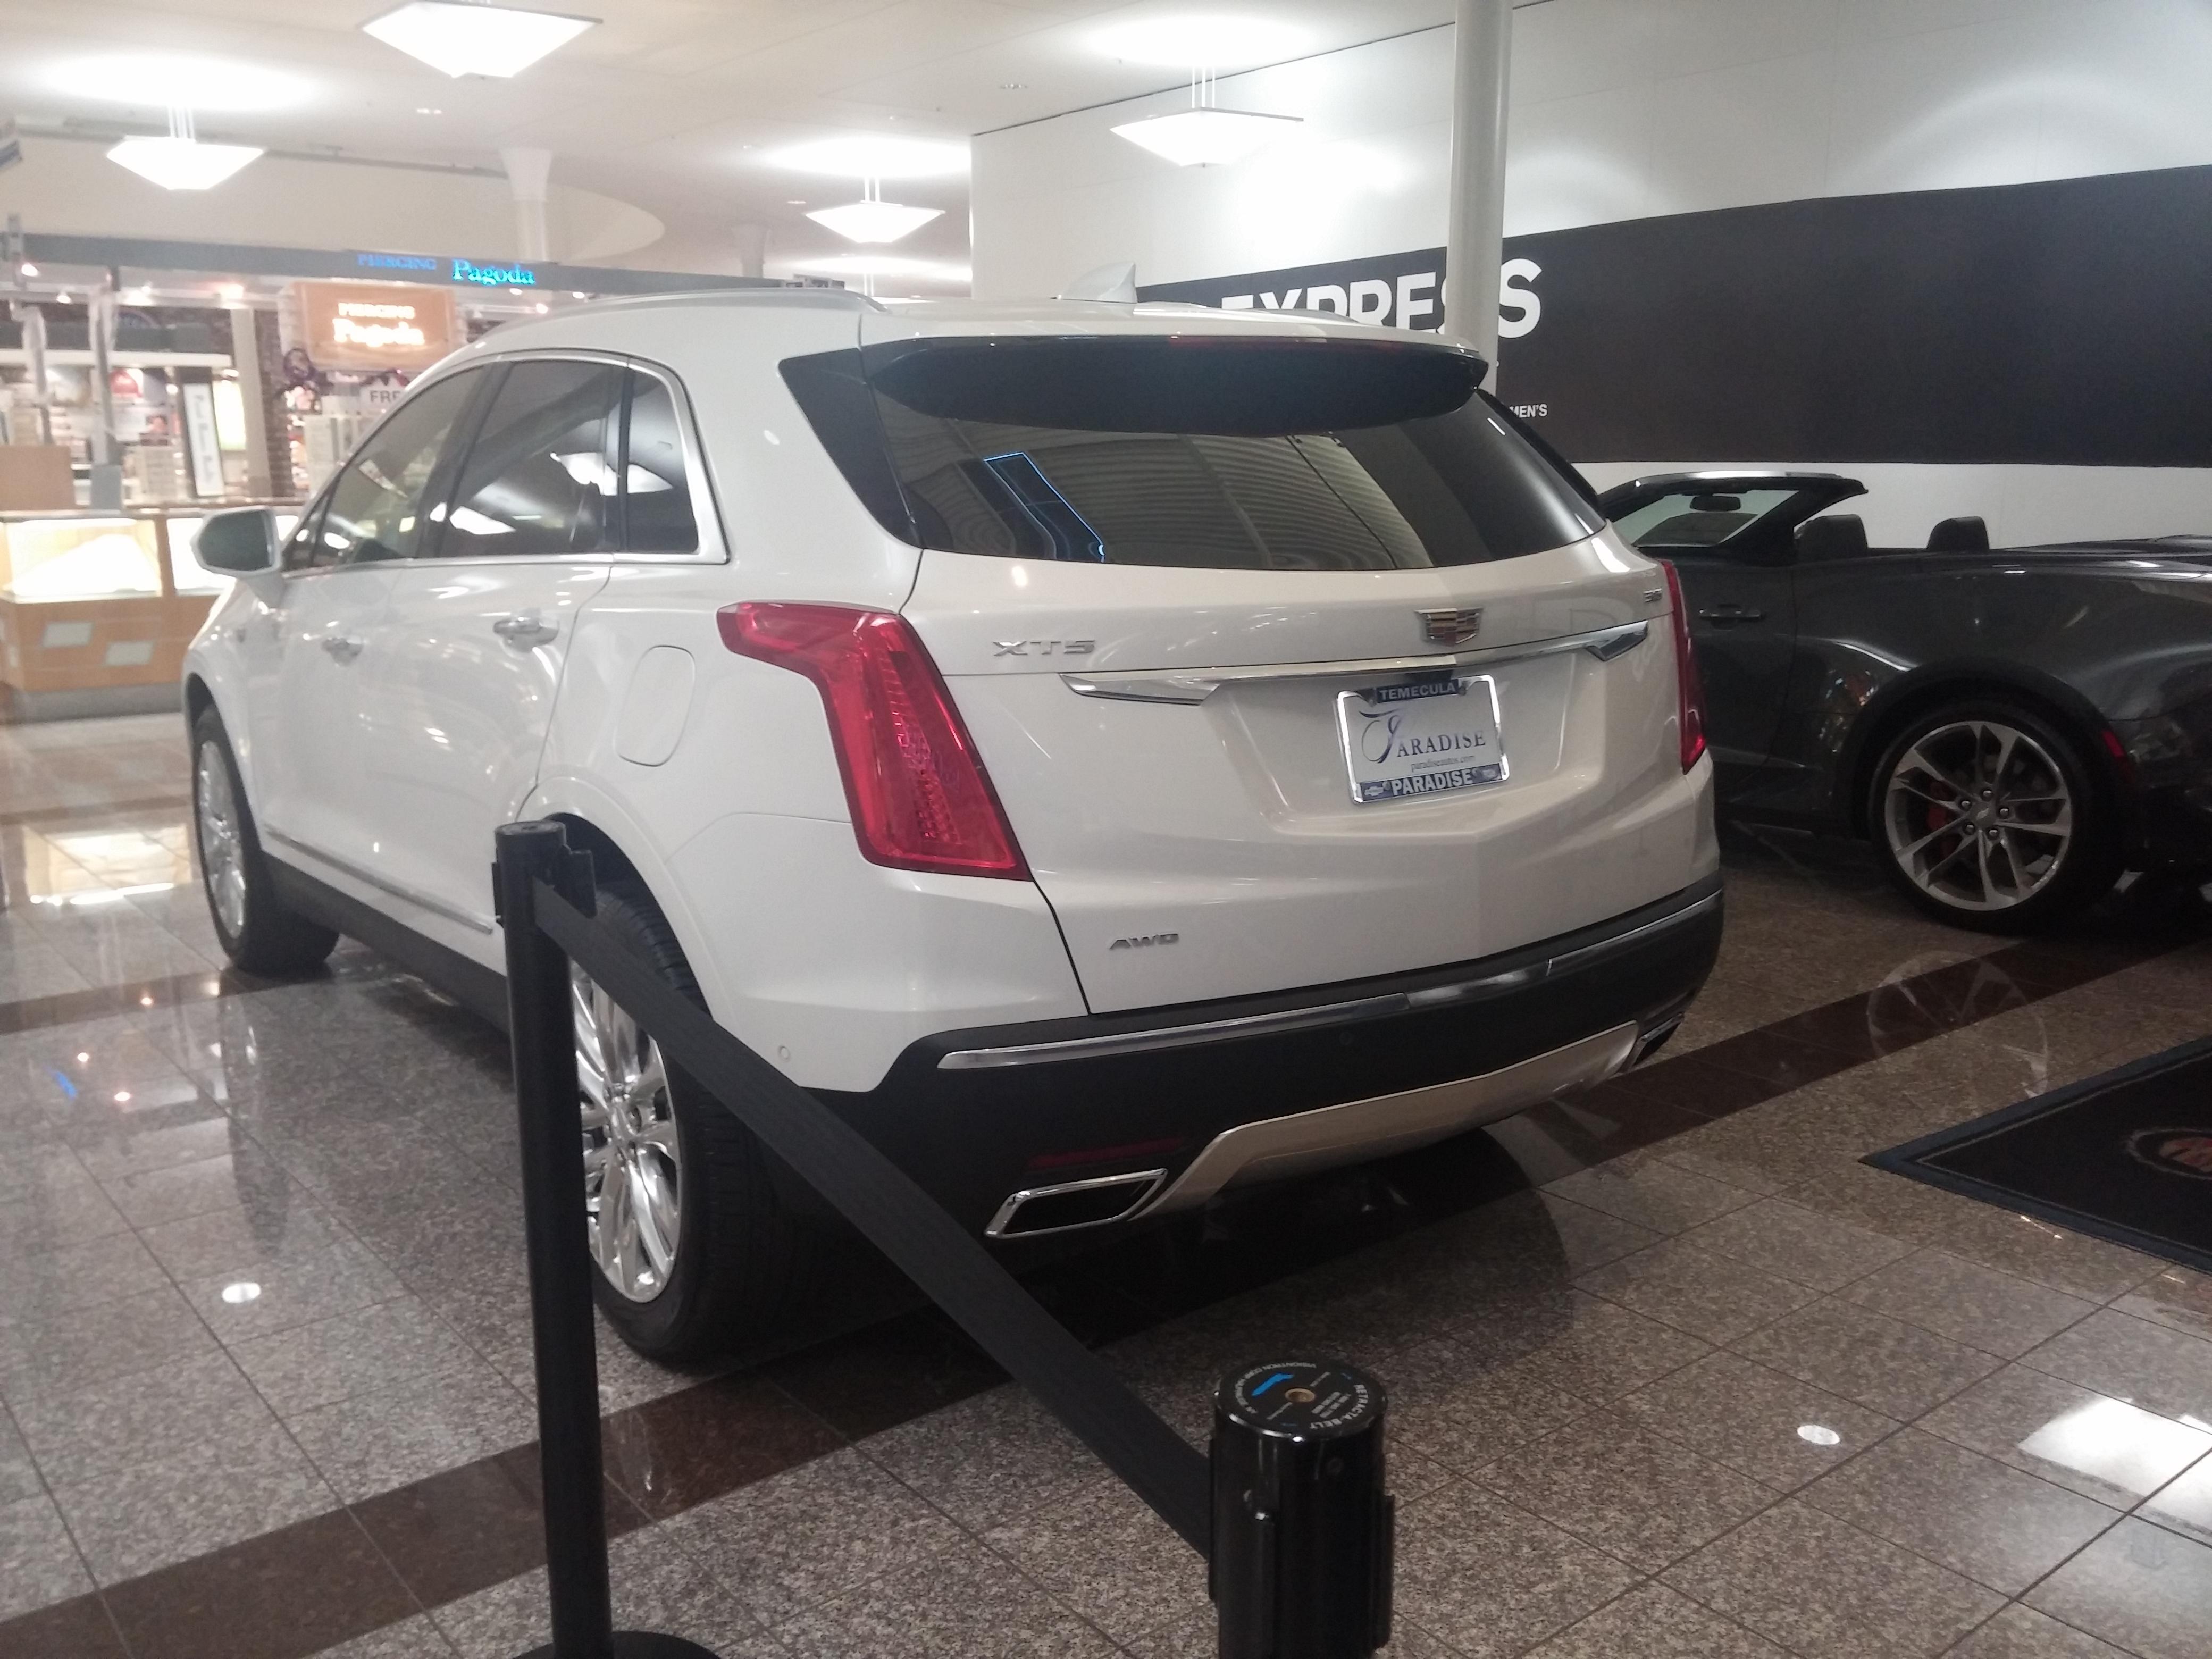 File Cadillac Xts 2016 Suv 2 Jpg Wikimedia Commons